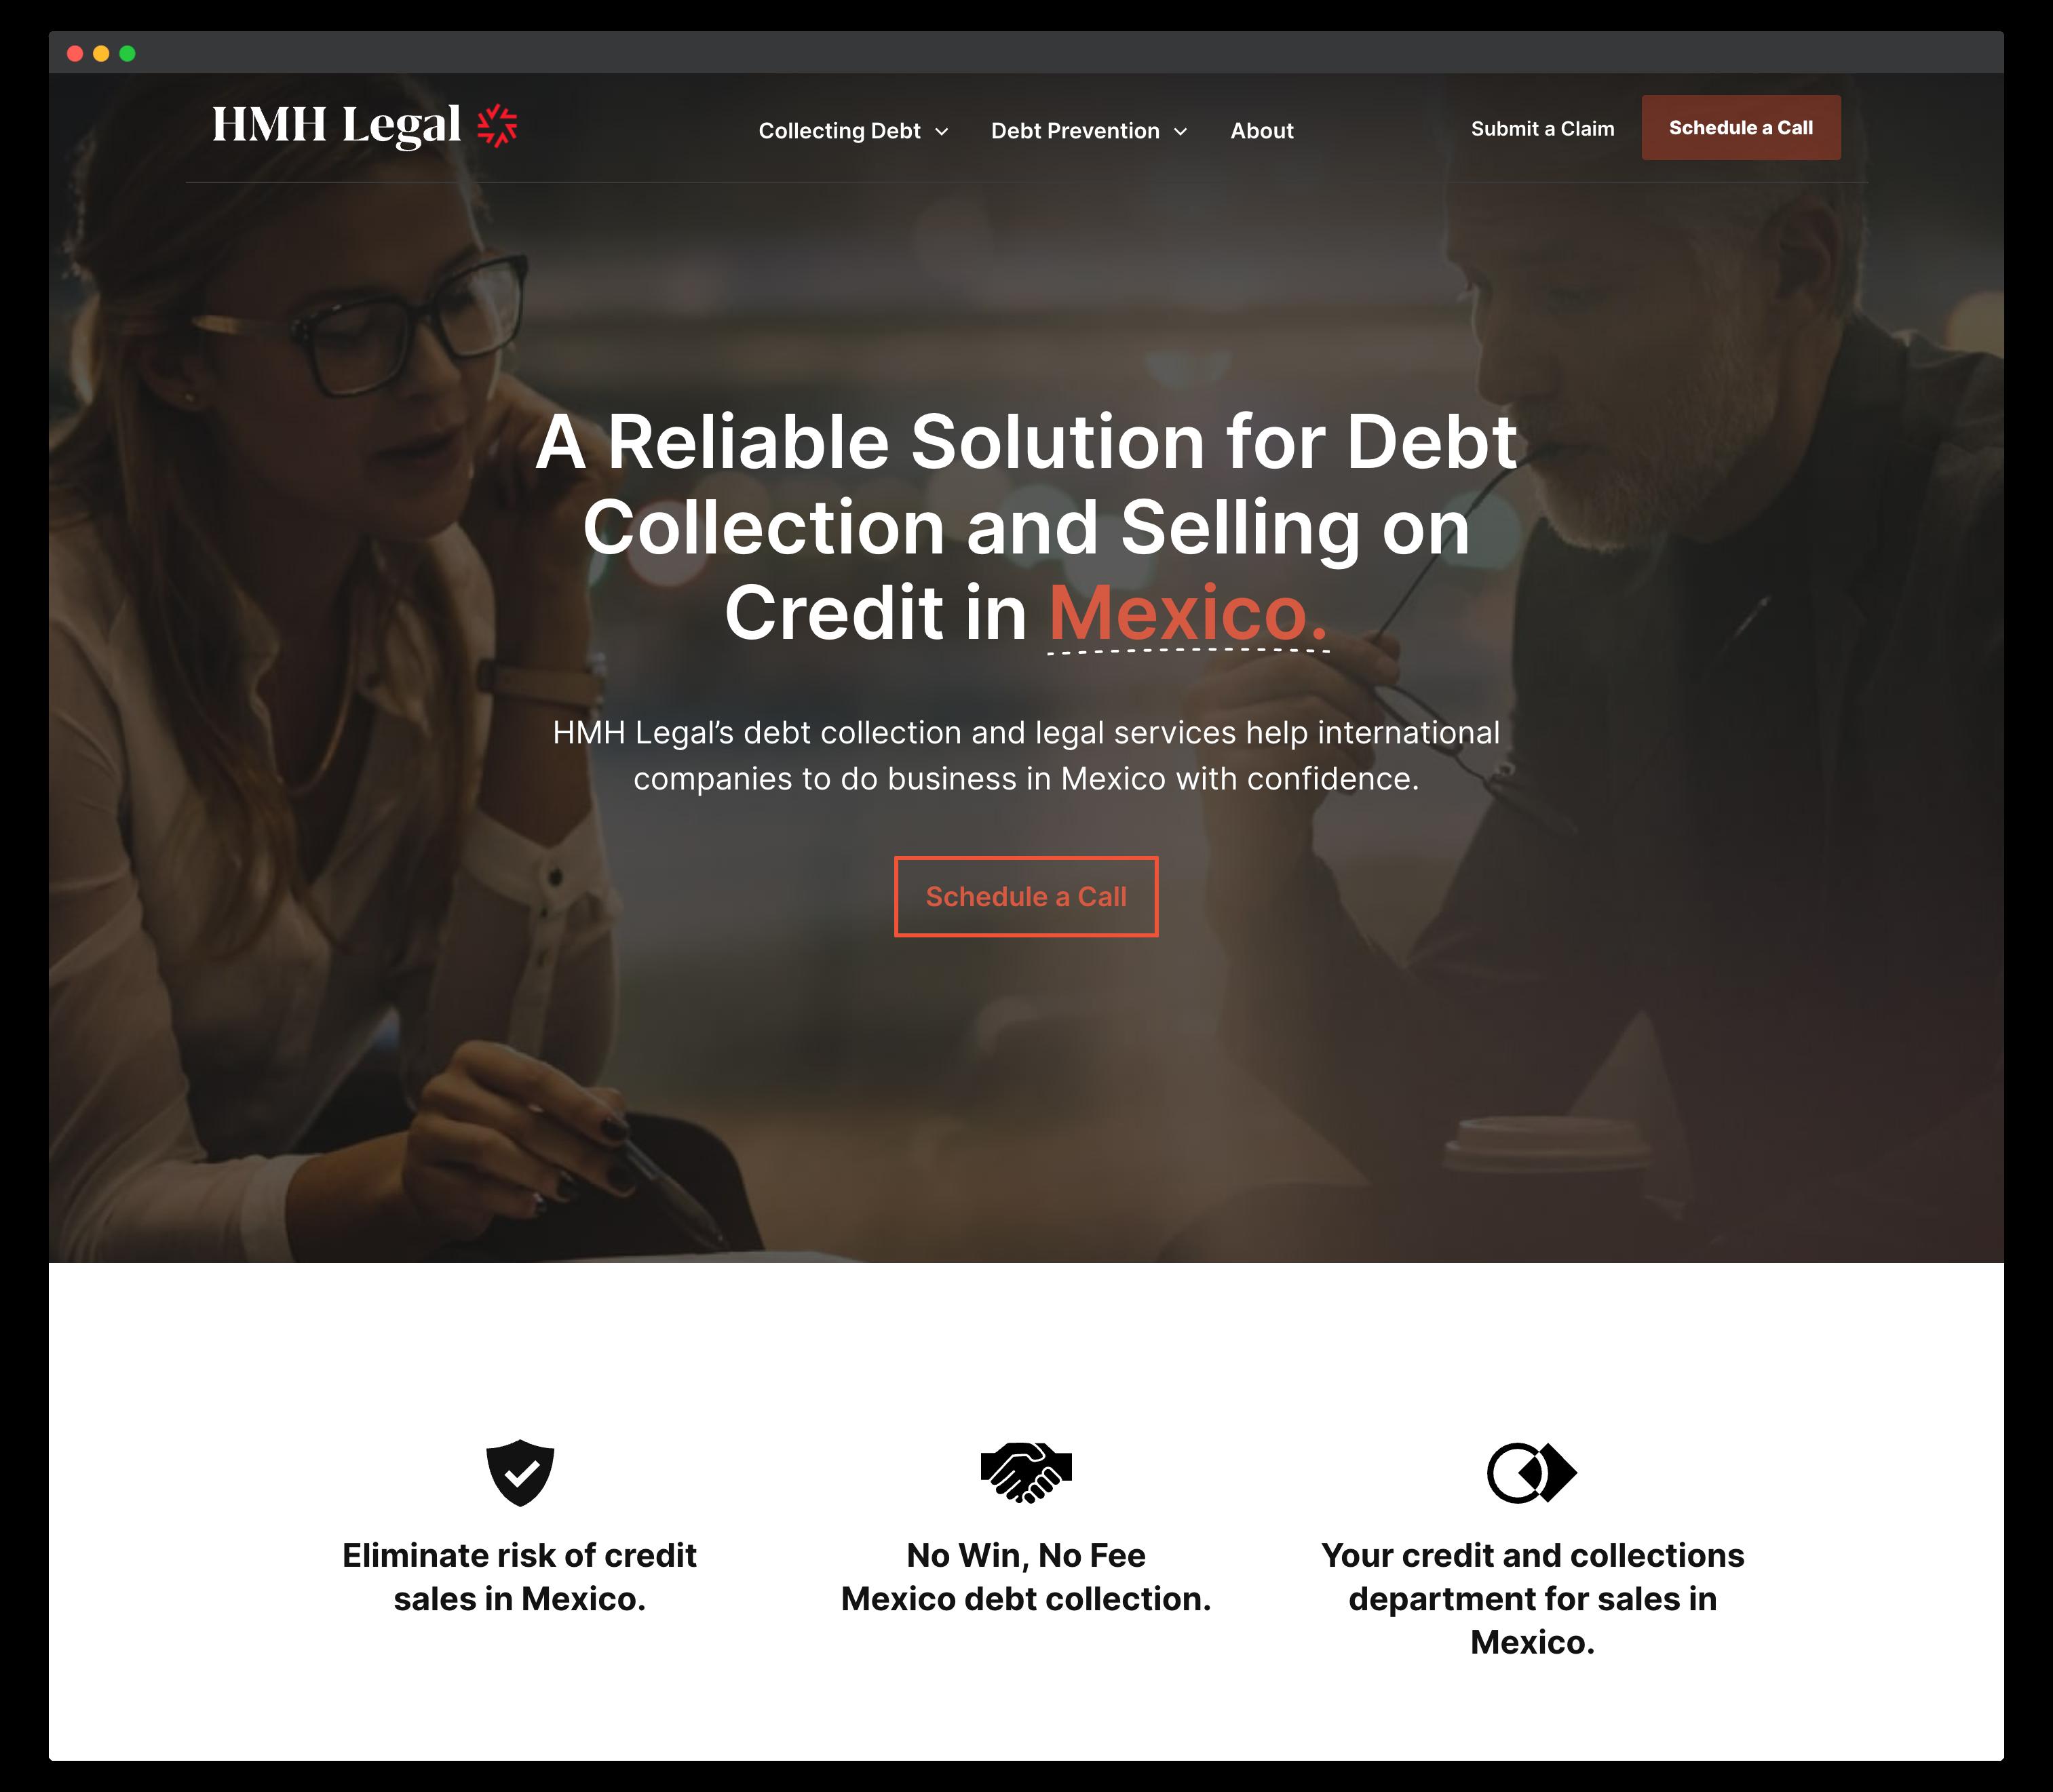 StoryBrand Website Example - HMH Legal